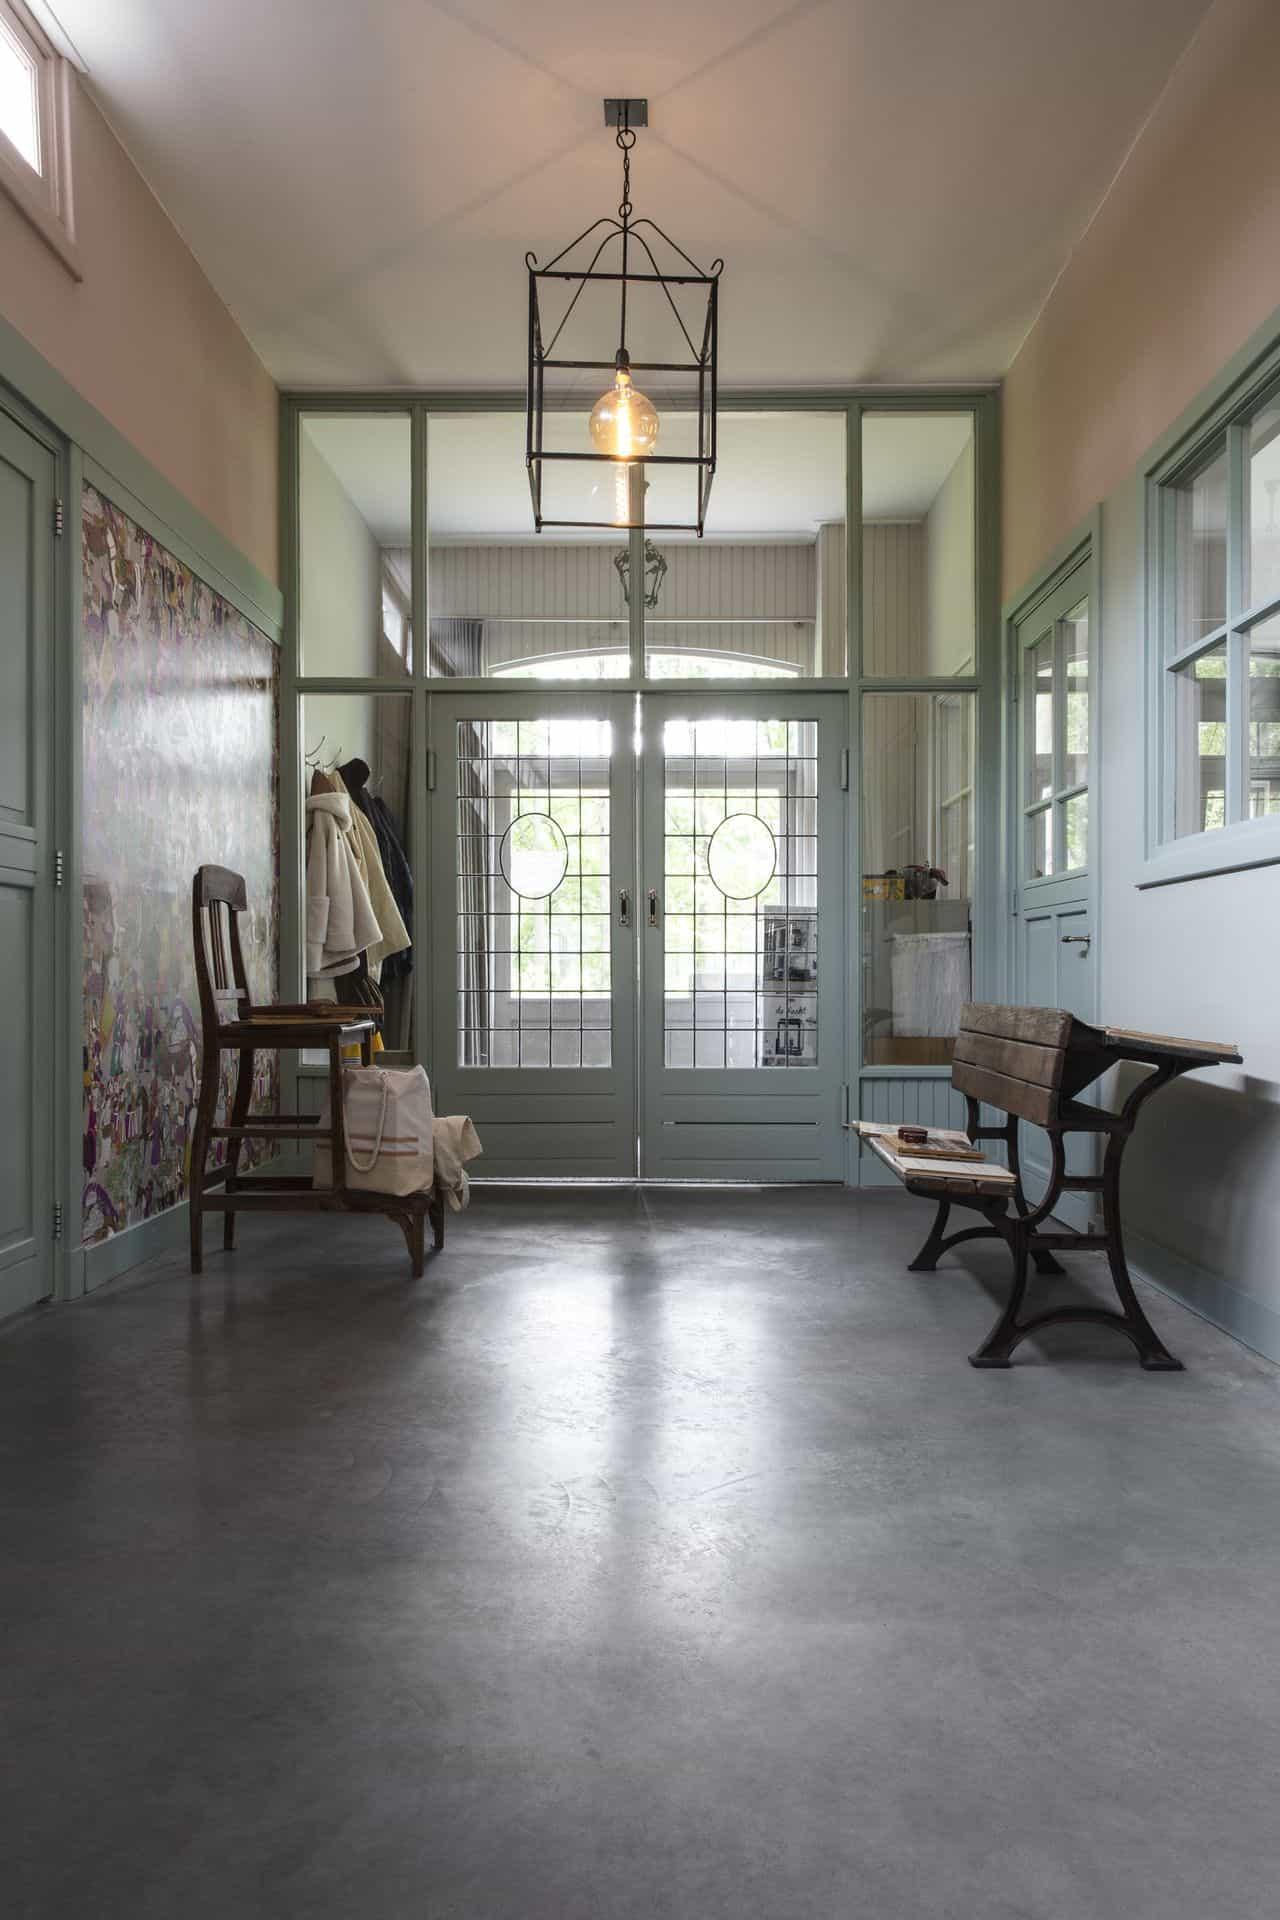 betonvloer oude school, betonvloer hal